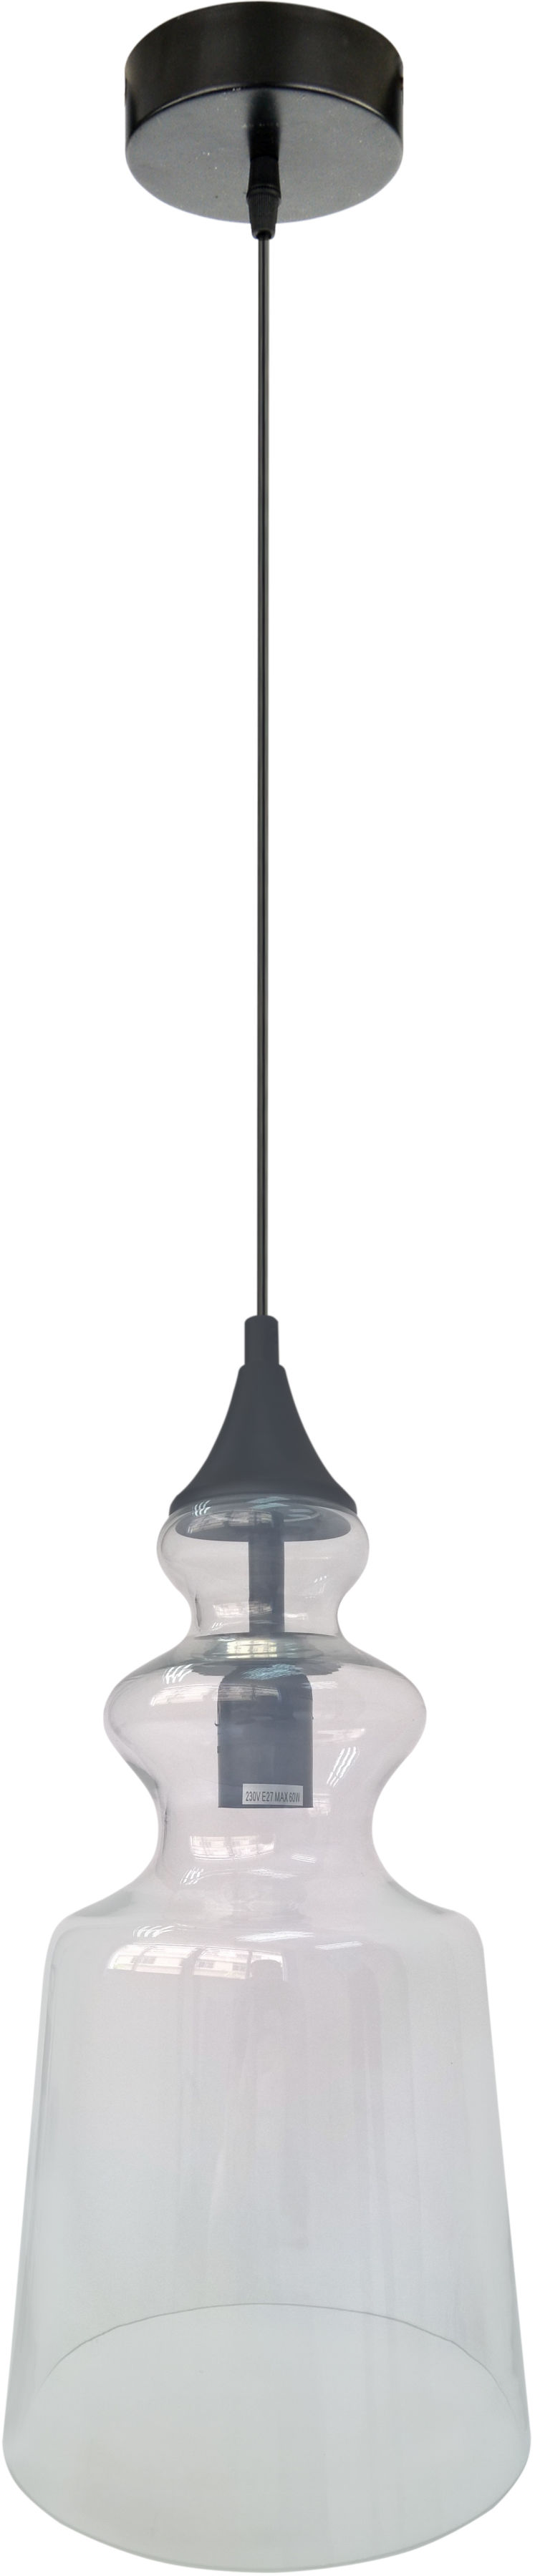 Candellux OXELO 31-51837 lampa wisząca bezbarwna 1X60W E27 20 cm